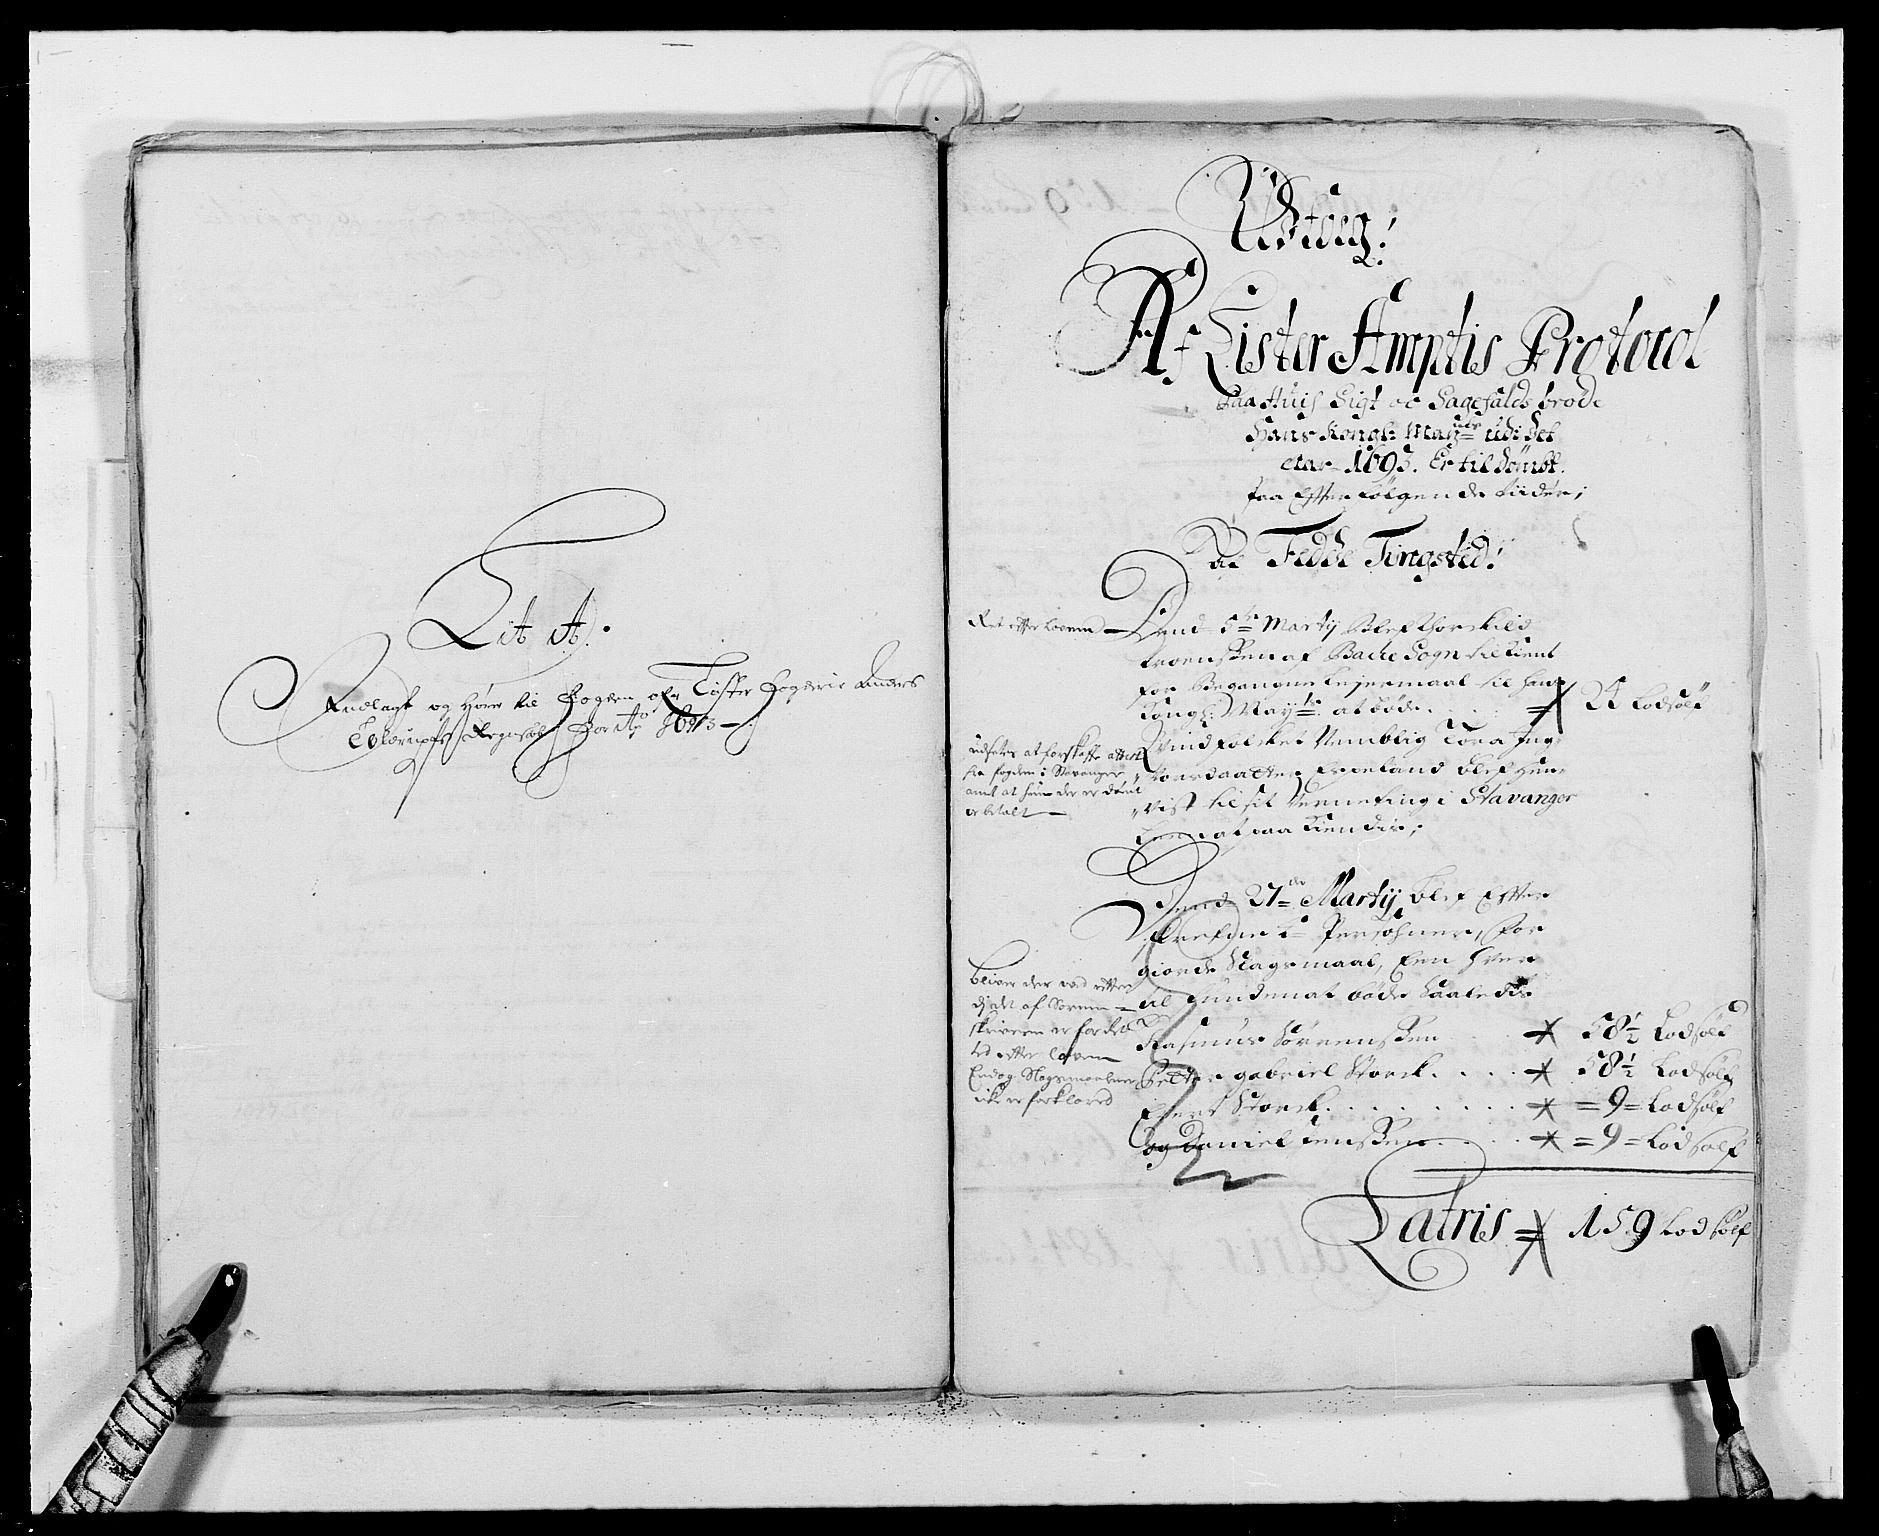 RA, Rentekammeret inntil 1814, Reviderte regnskaper, Fogderegnskap, R41/L2536: Fogderegnskap Lista, 1690-1693, s. 434